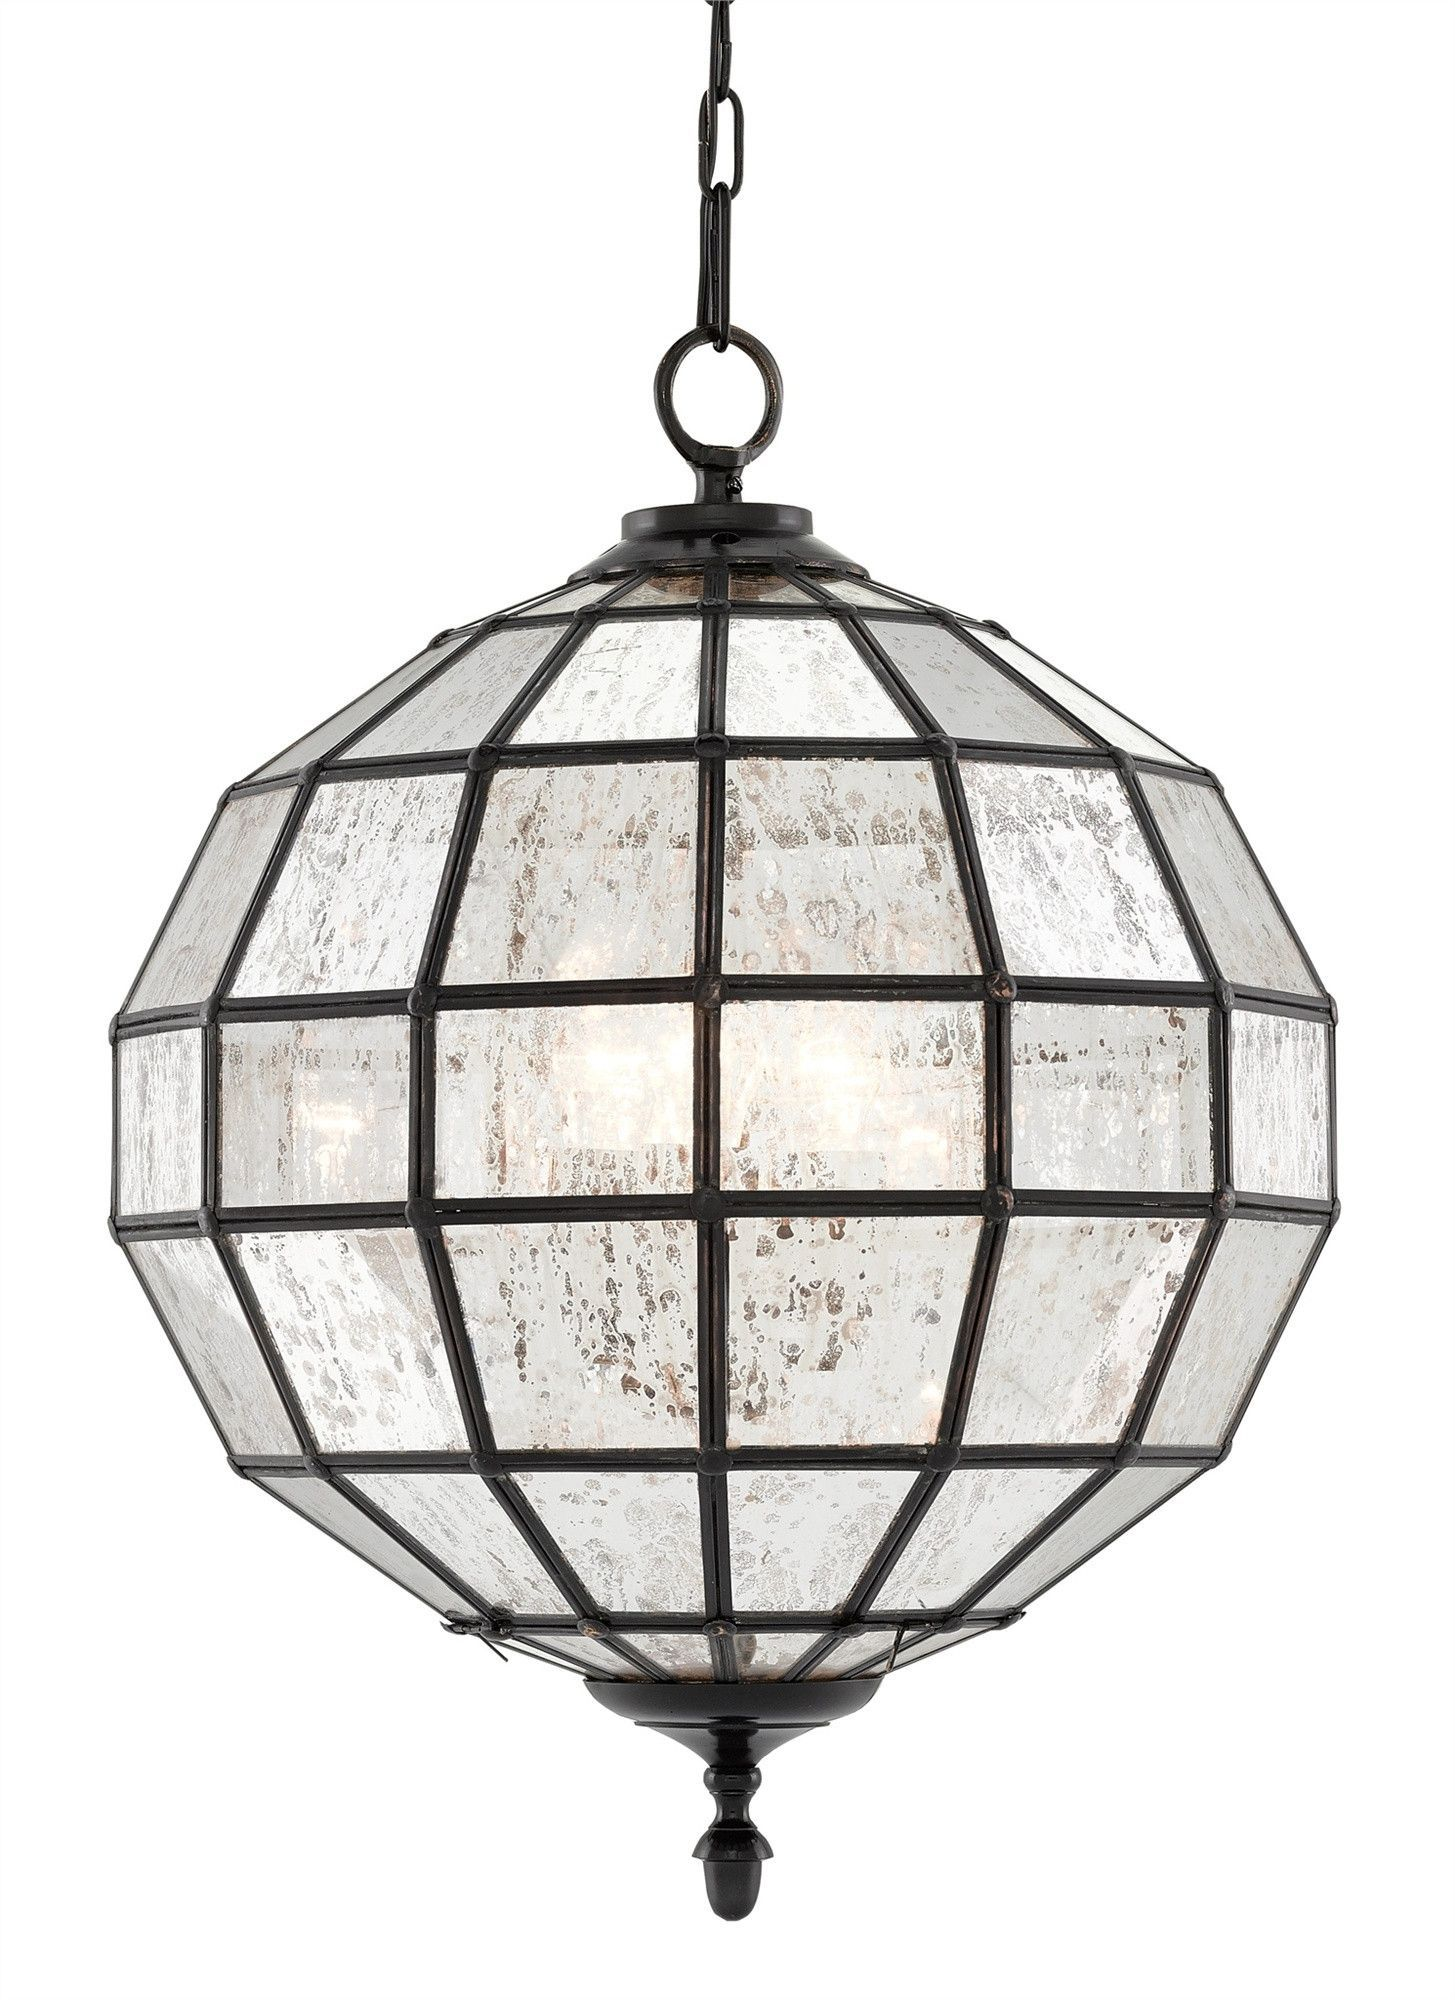 Currey company axwell chandelier foyer lighting pendant lighting family room lighting chandelier lighting